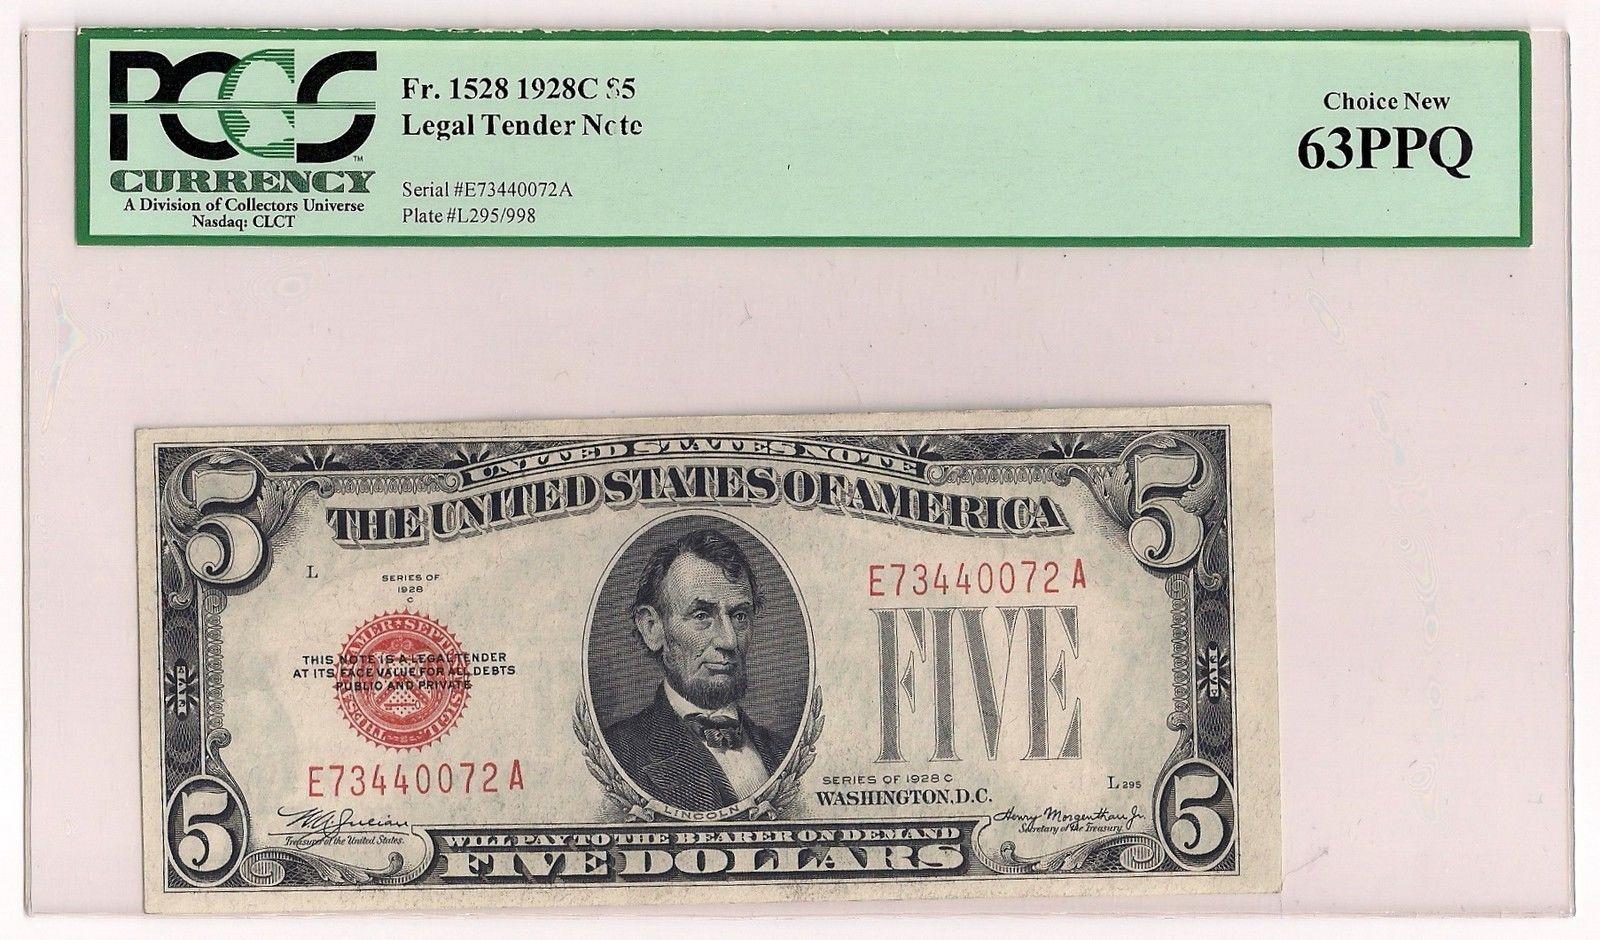 1928 C $5 Five Dollar Legal Tender Note Fr. 1528 Graded PCGS Choice Ne.jpg